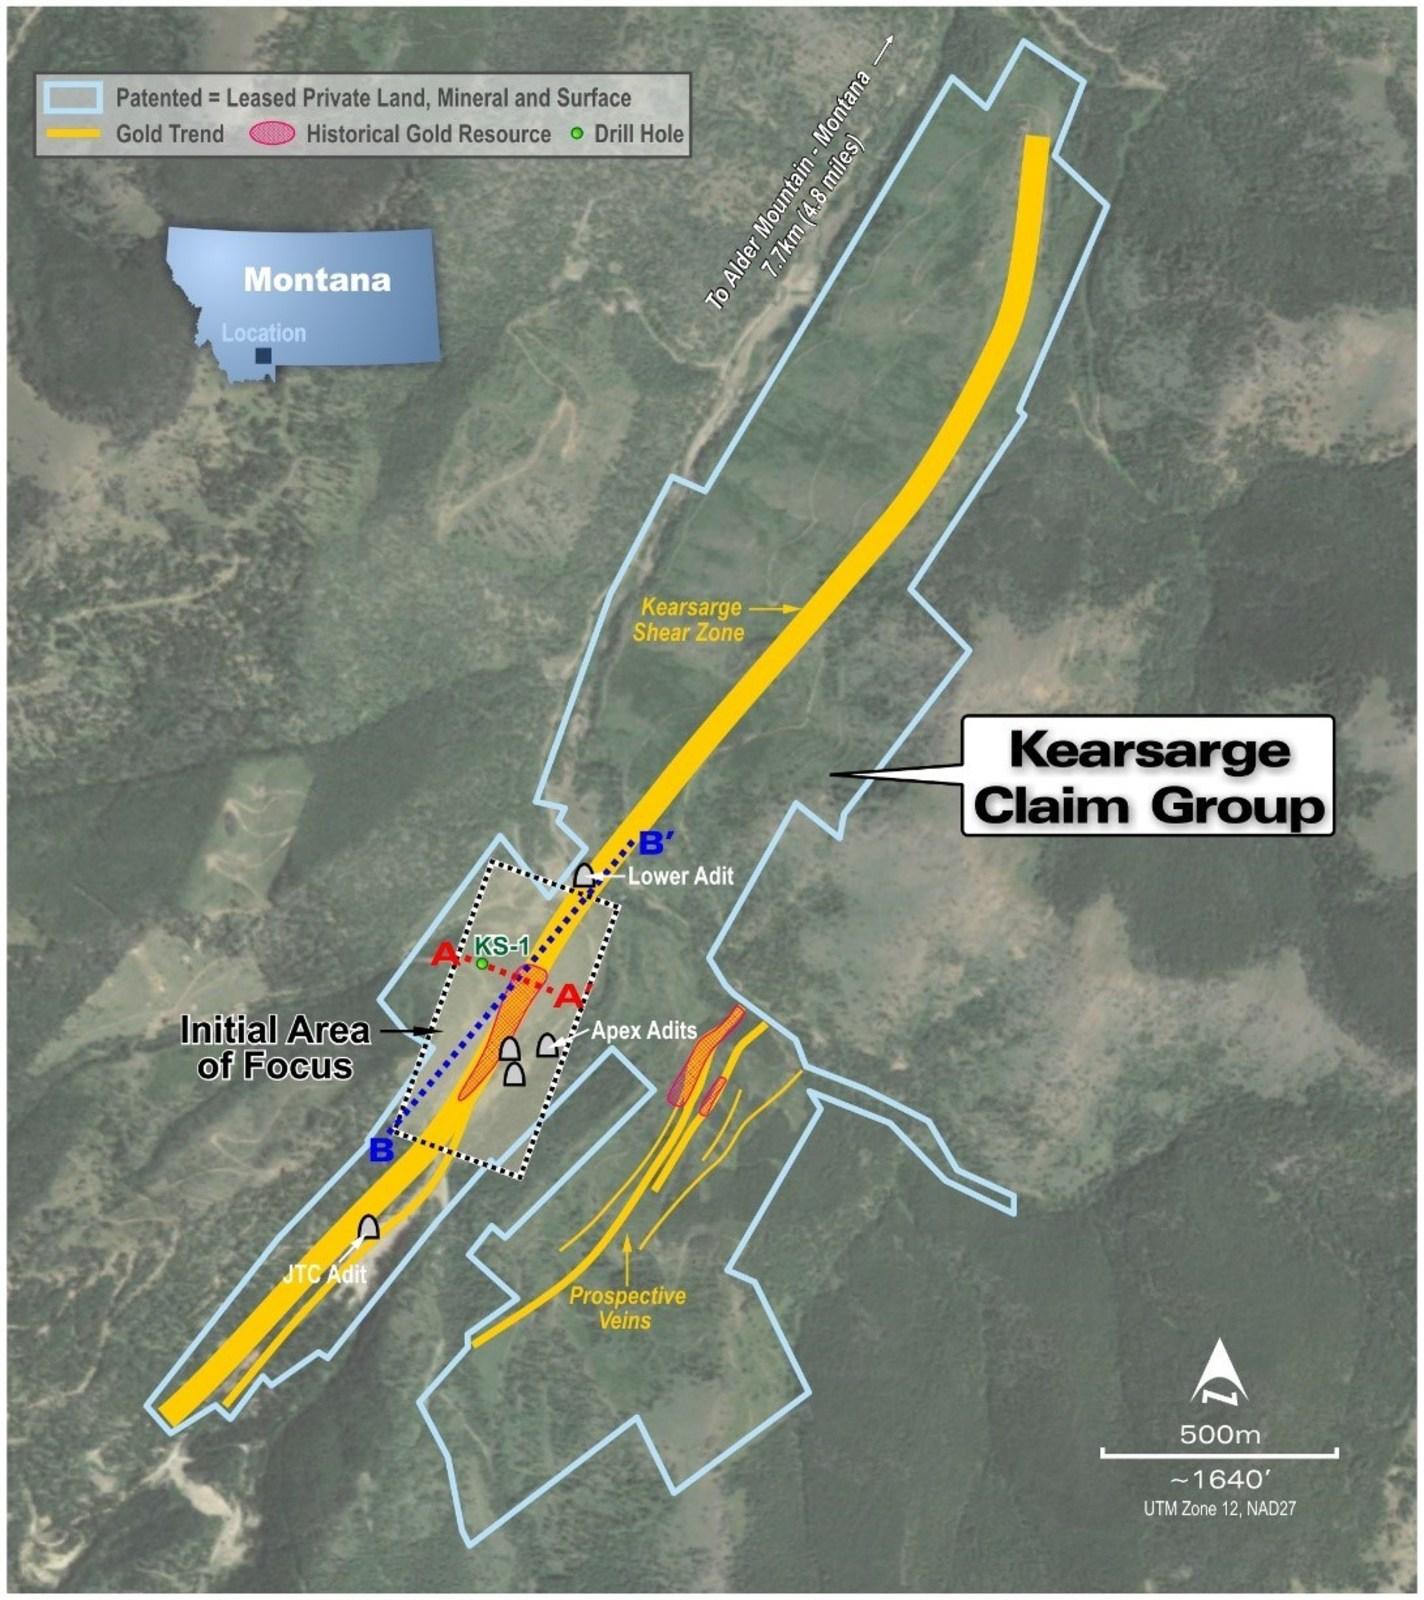 Figure 1: Kearsarge Leases including Initial Area of Focus